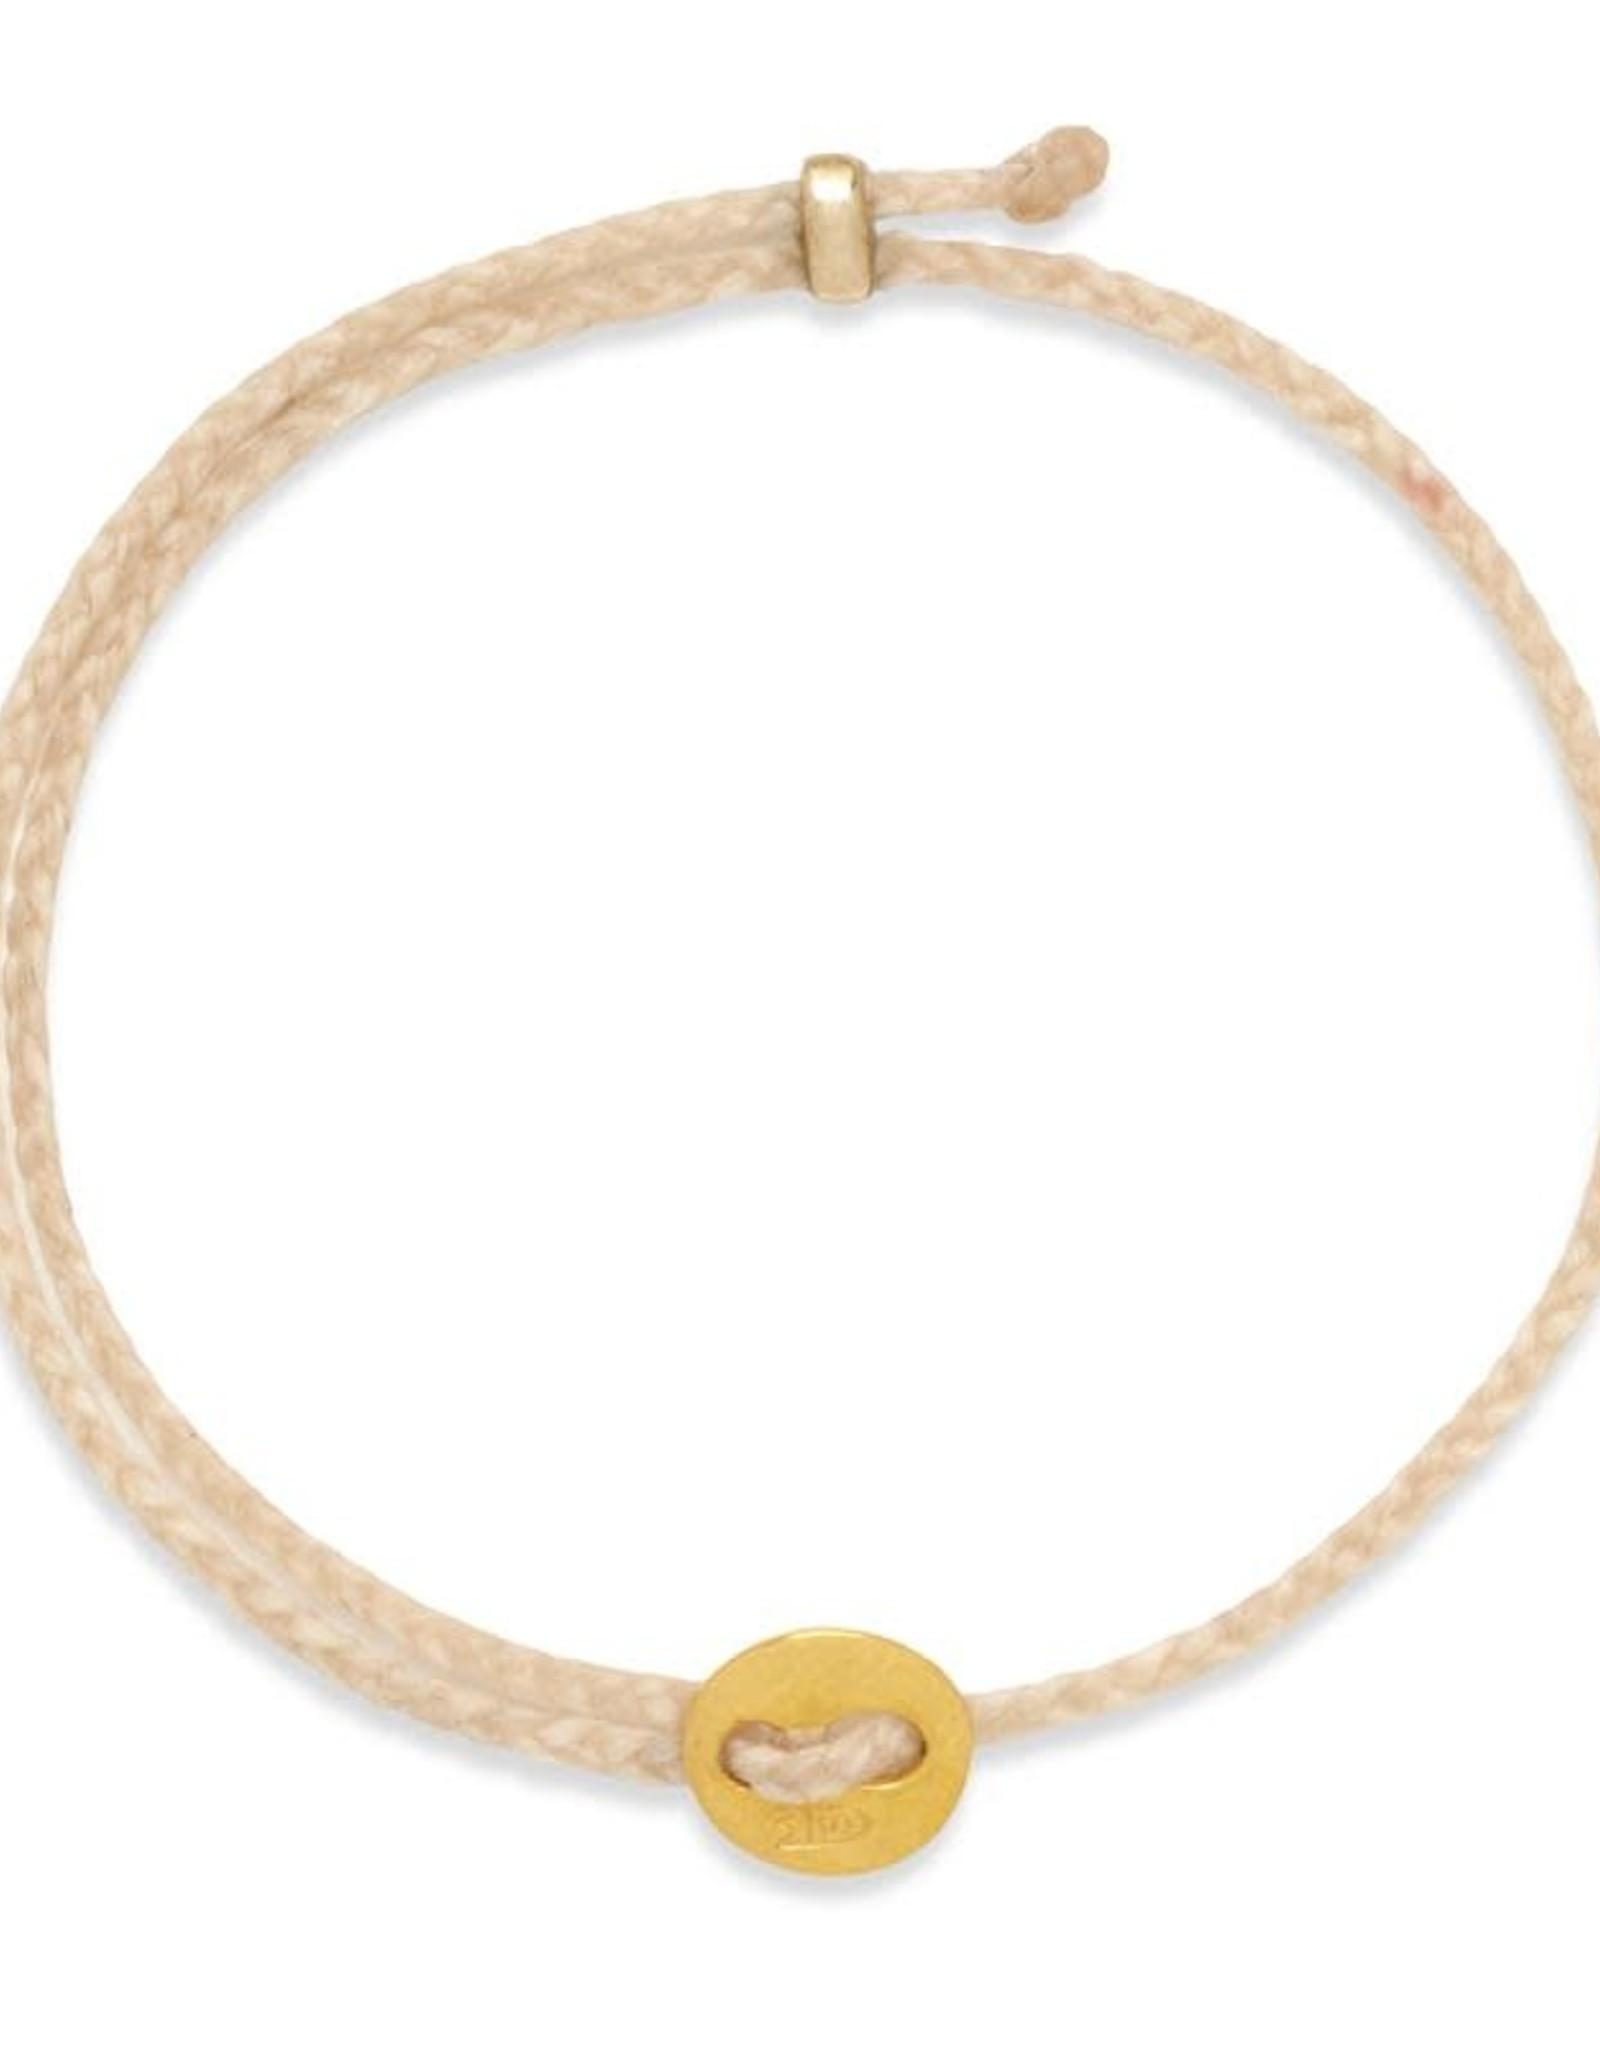 Scosha Signature Brass Slider Bracelet - Natural